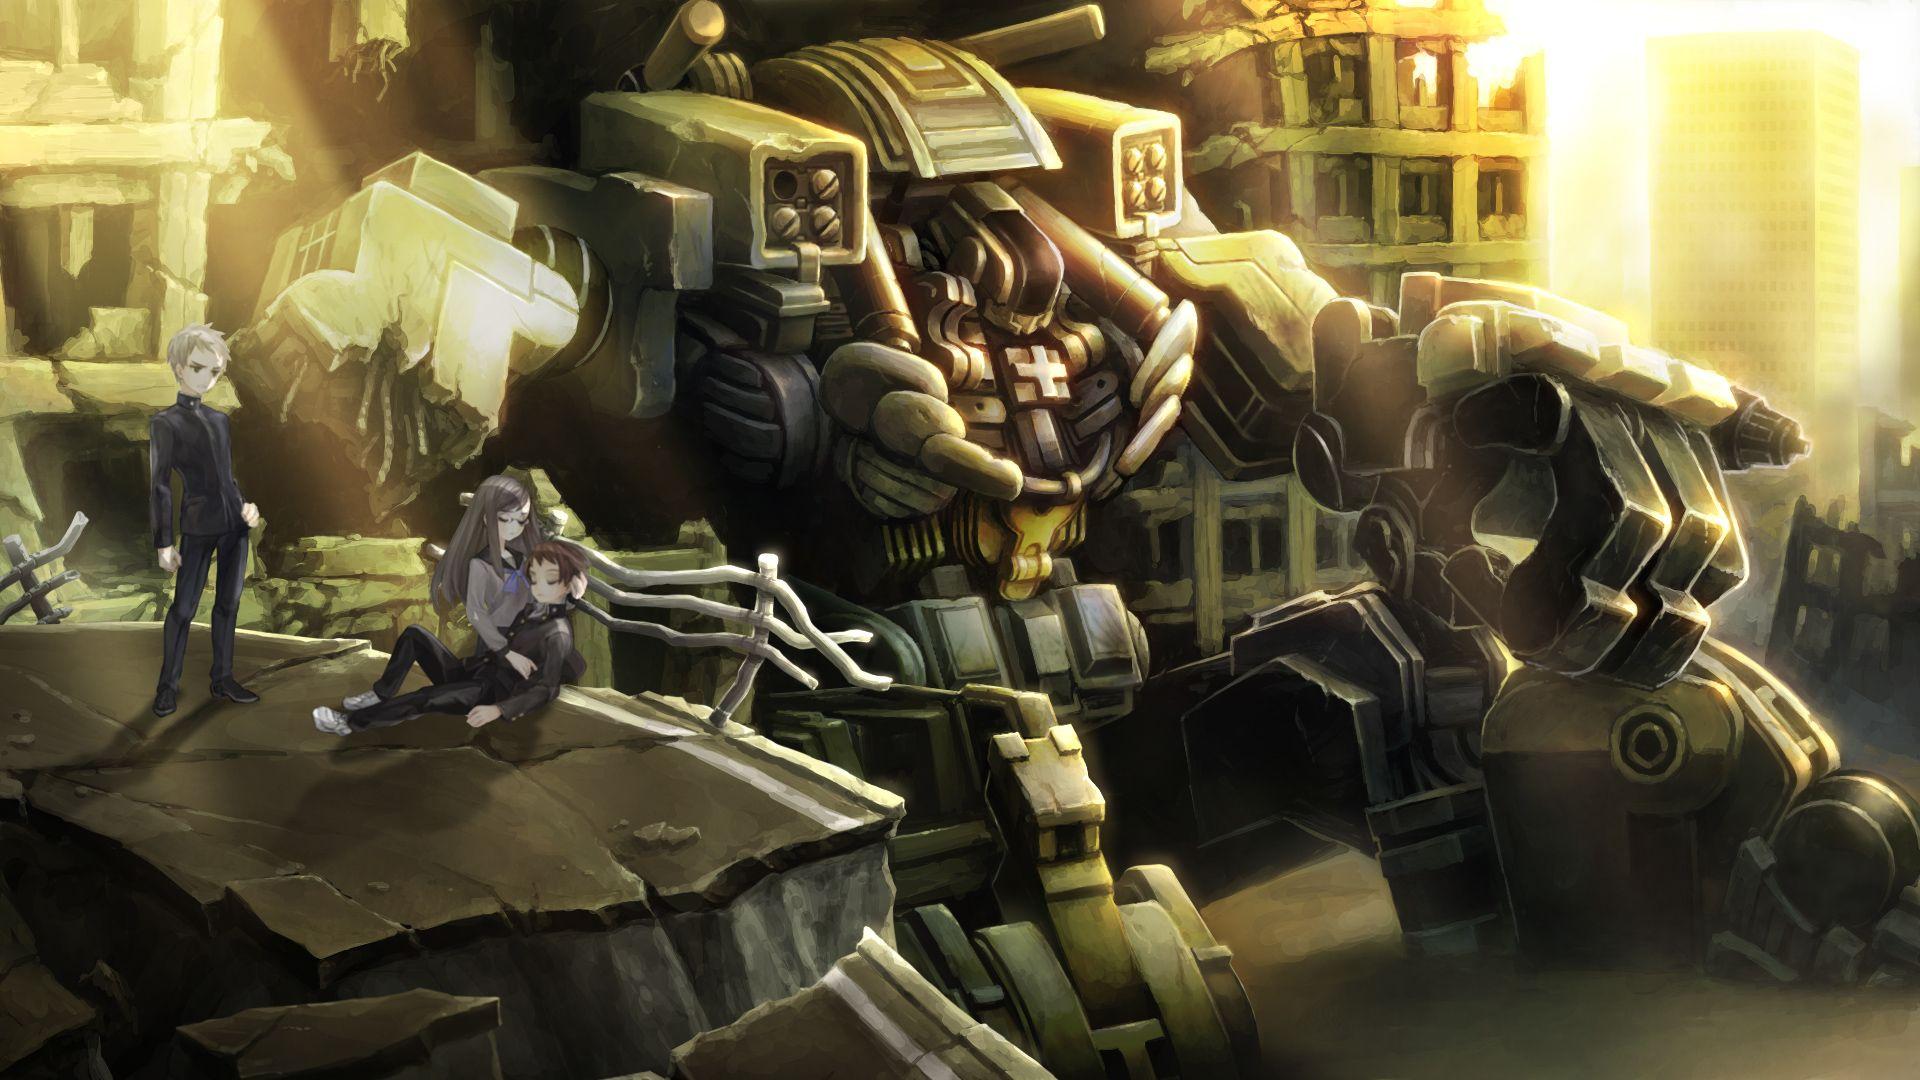 13-Sentinels